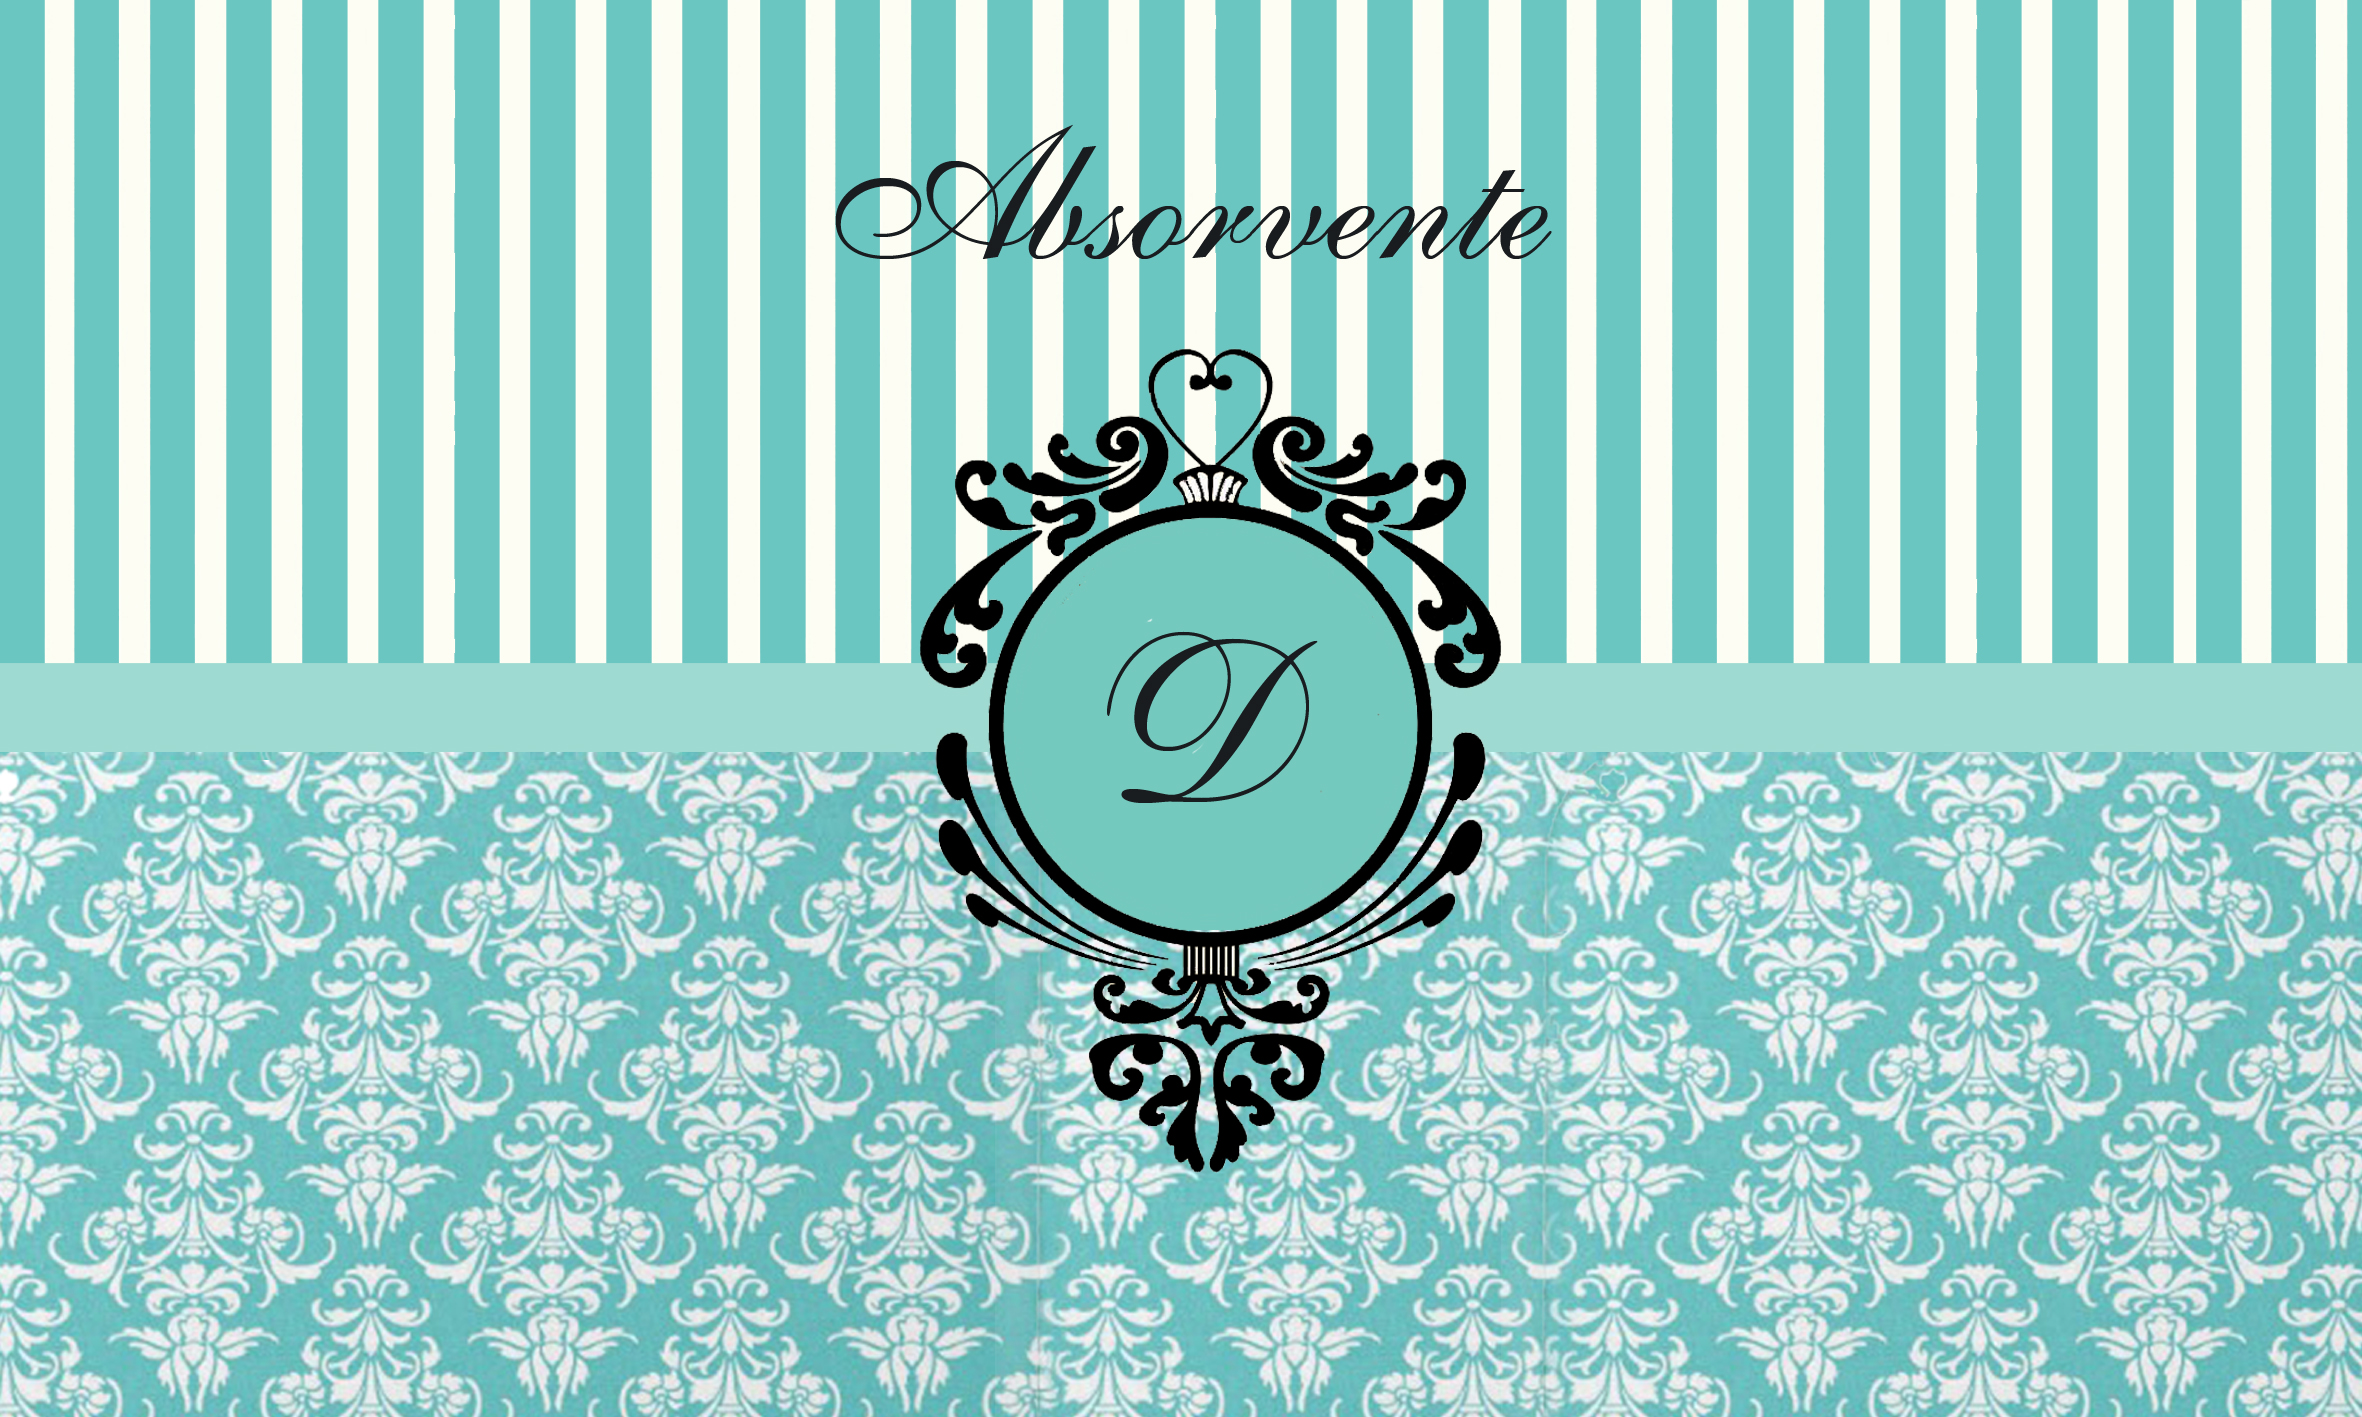 kit toillet  Azul tiffany Lia Fernandes Criações Elo7 #3C8F8C 2362x1417 Banheiro Azul Tiffany